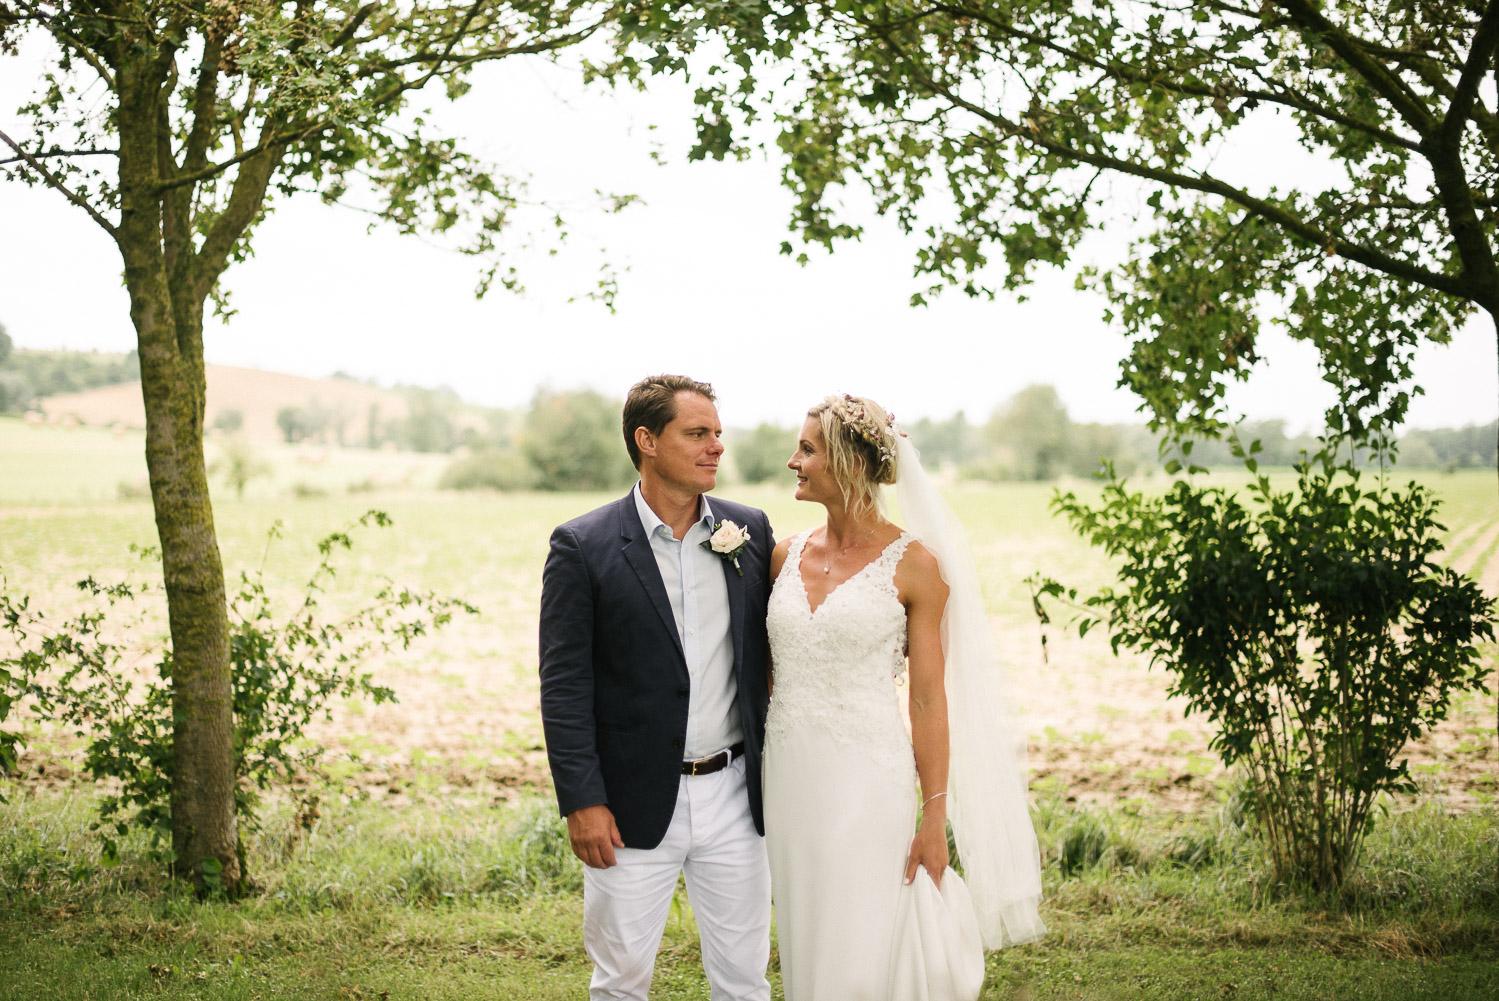 chateau_la_commanderie_mirepoix__wedding_katy_webb_photography_france_UK134